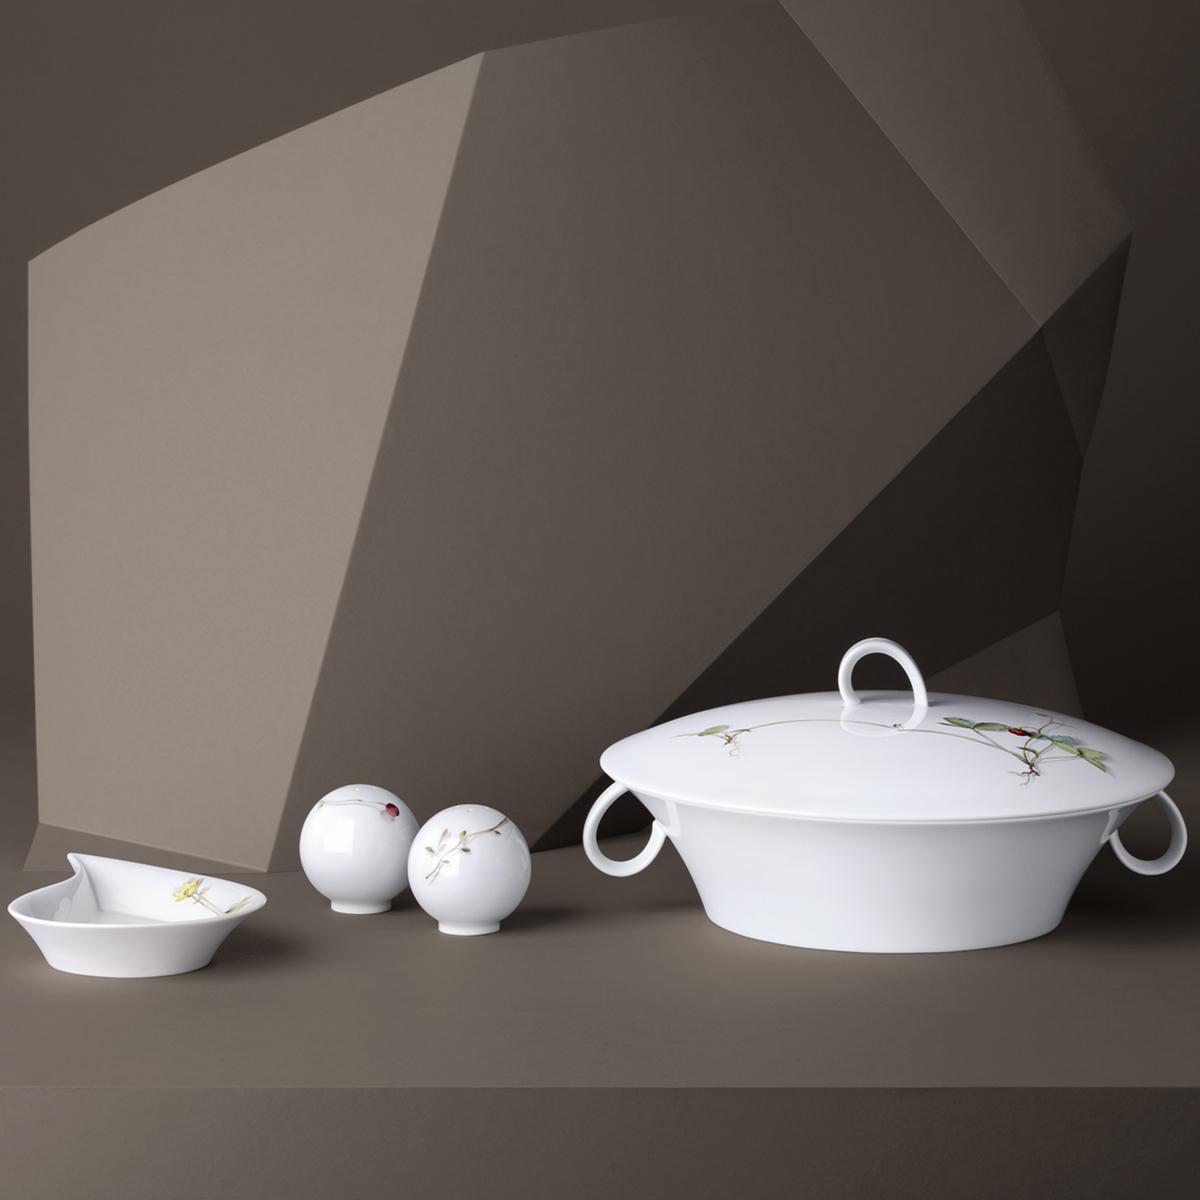 kpm berlin pianta porzellan. Black Bedroom Furniture Sets. Home Design Ideas